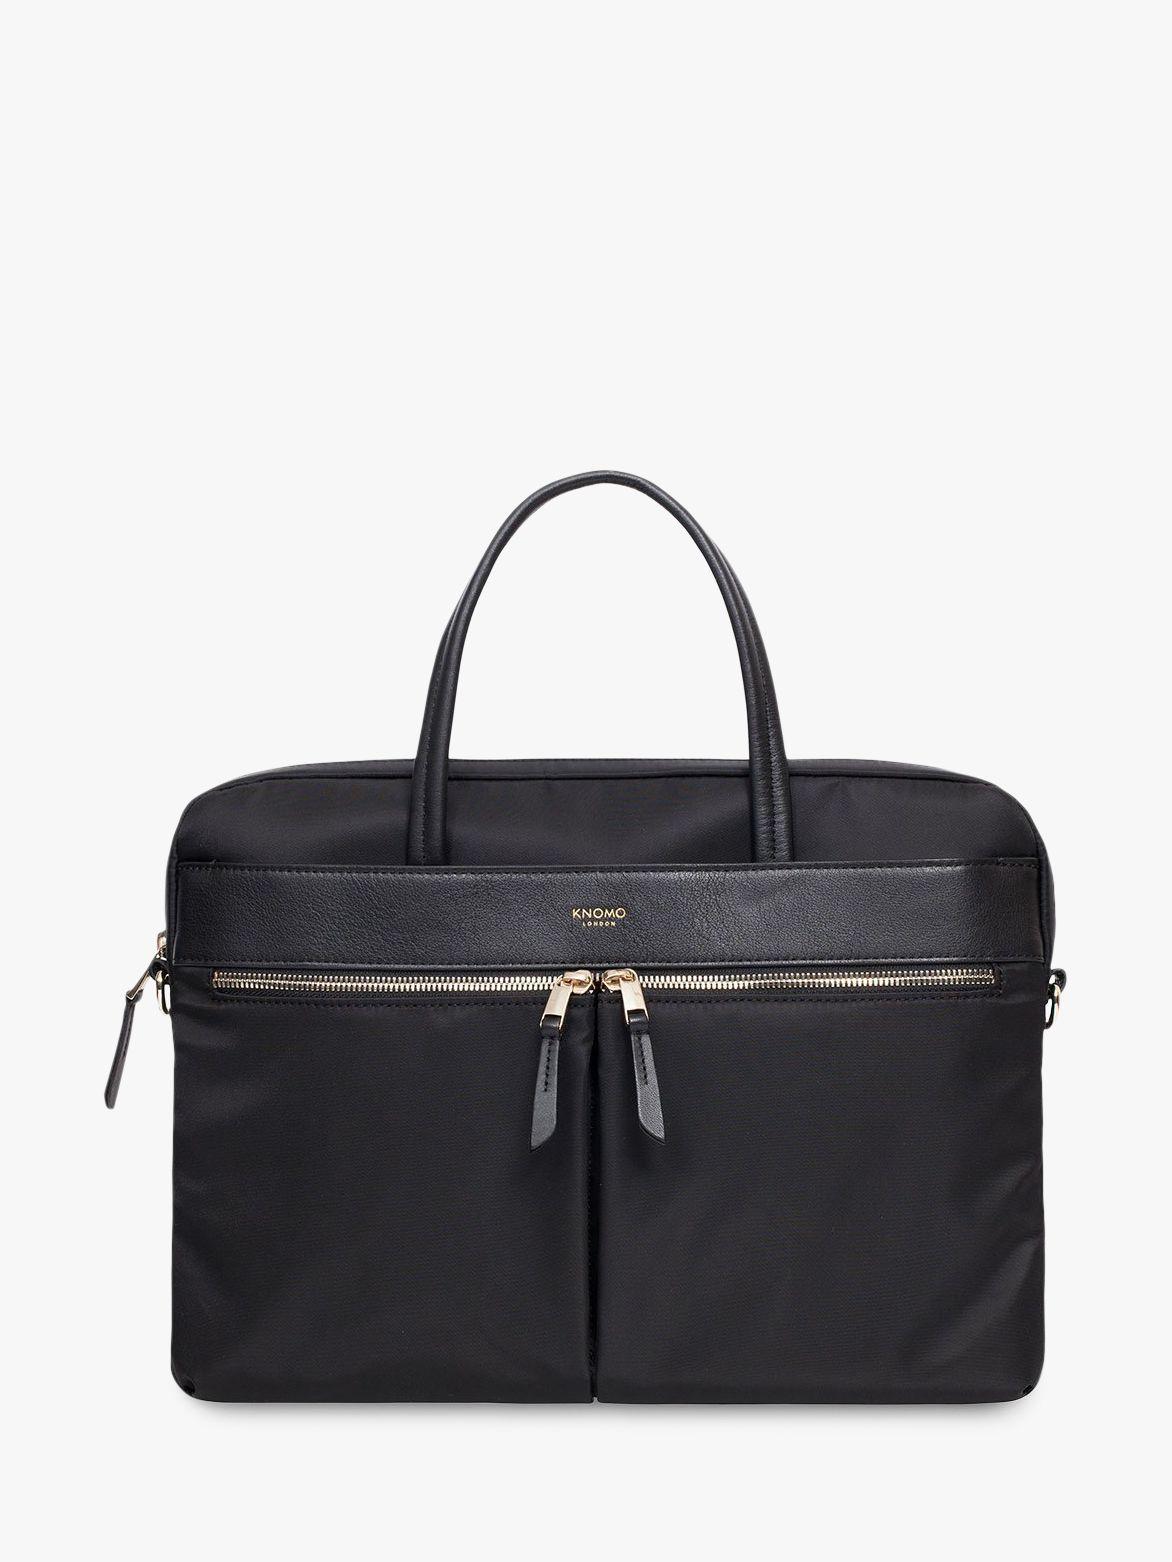 "Knomo KNOMO Hanover 14"" Laptop Briefcase, Black"